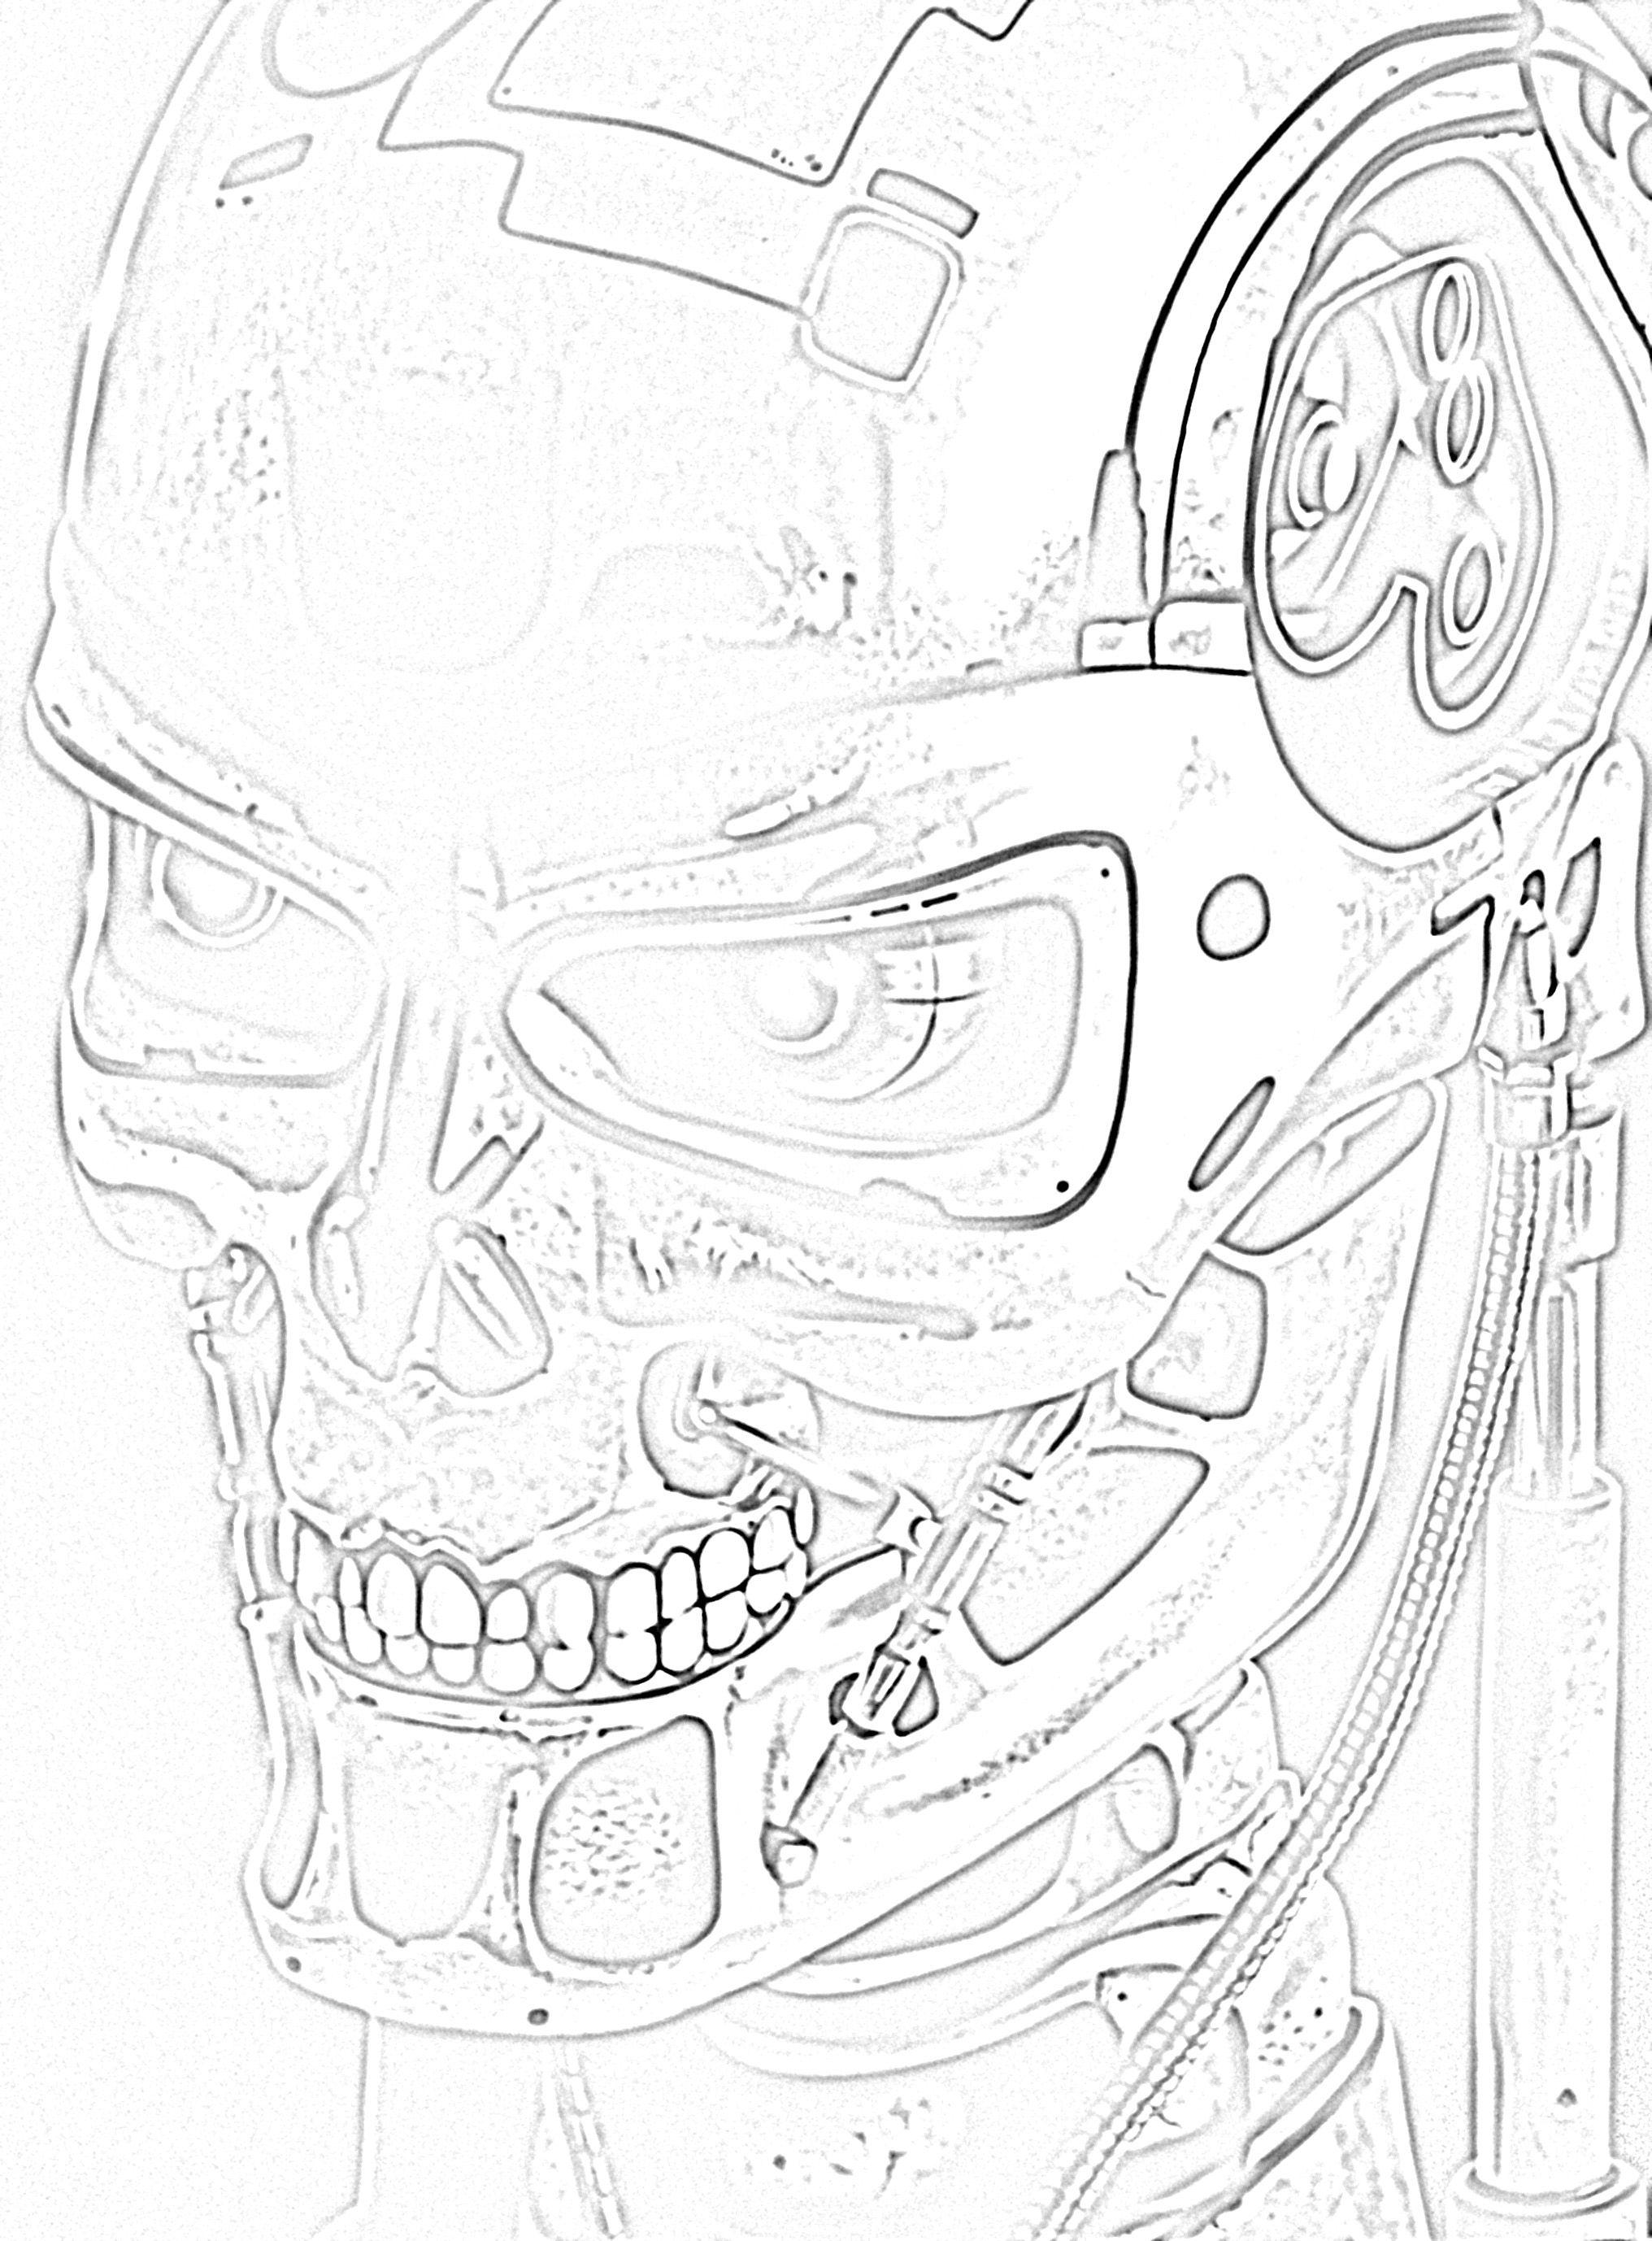 Iran Atelier Atelier Art Humanoid Sketch